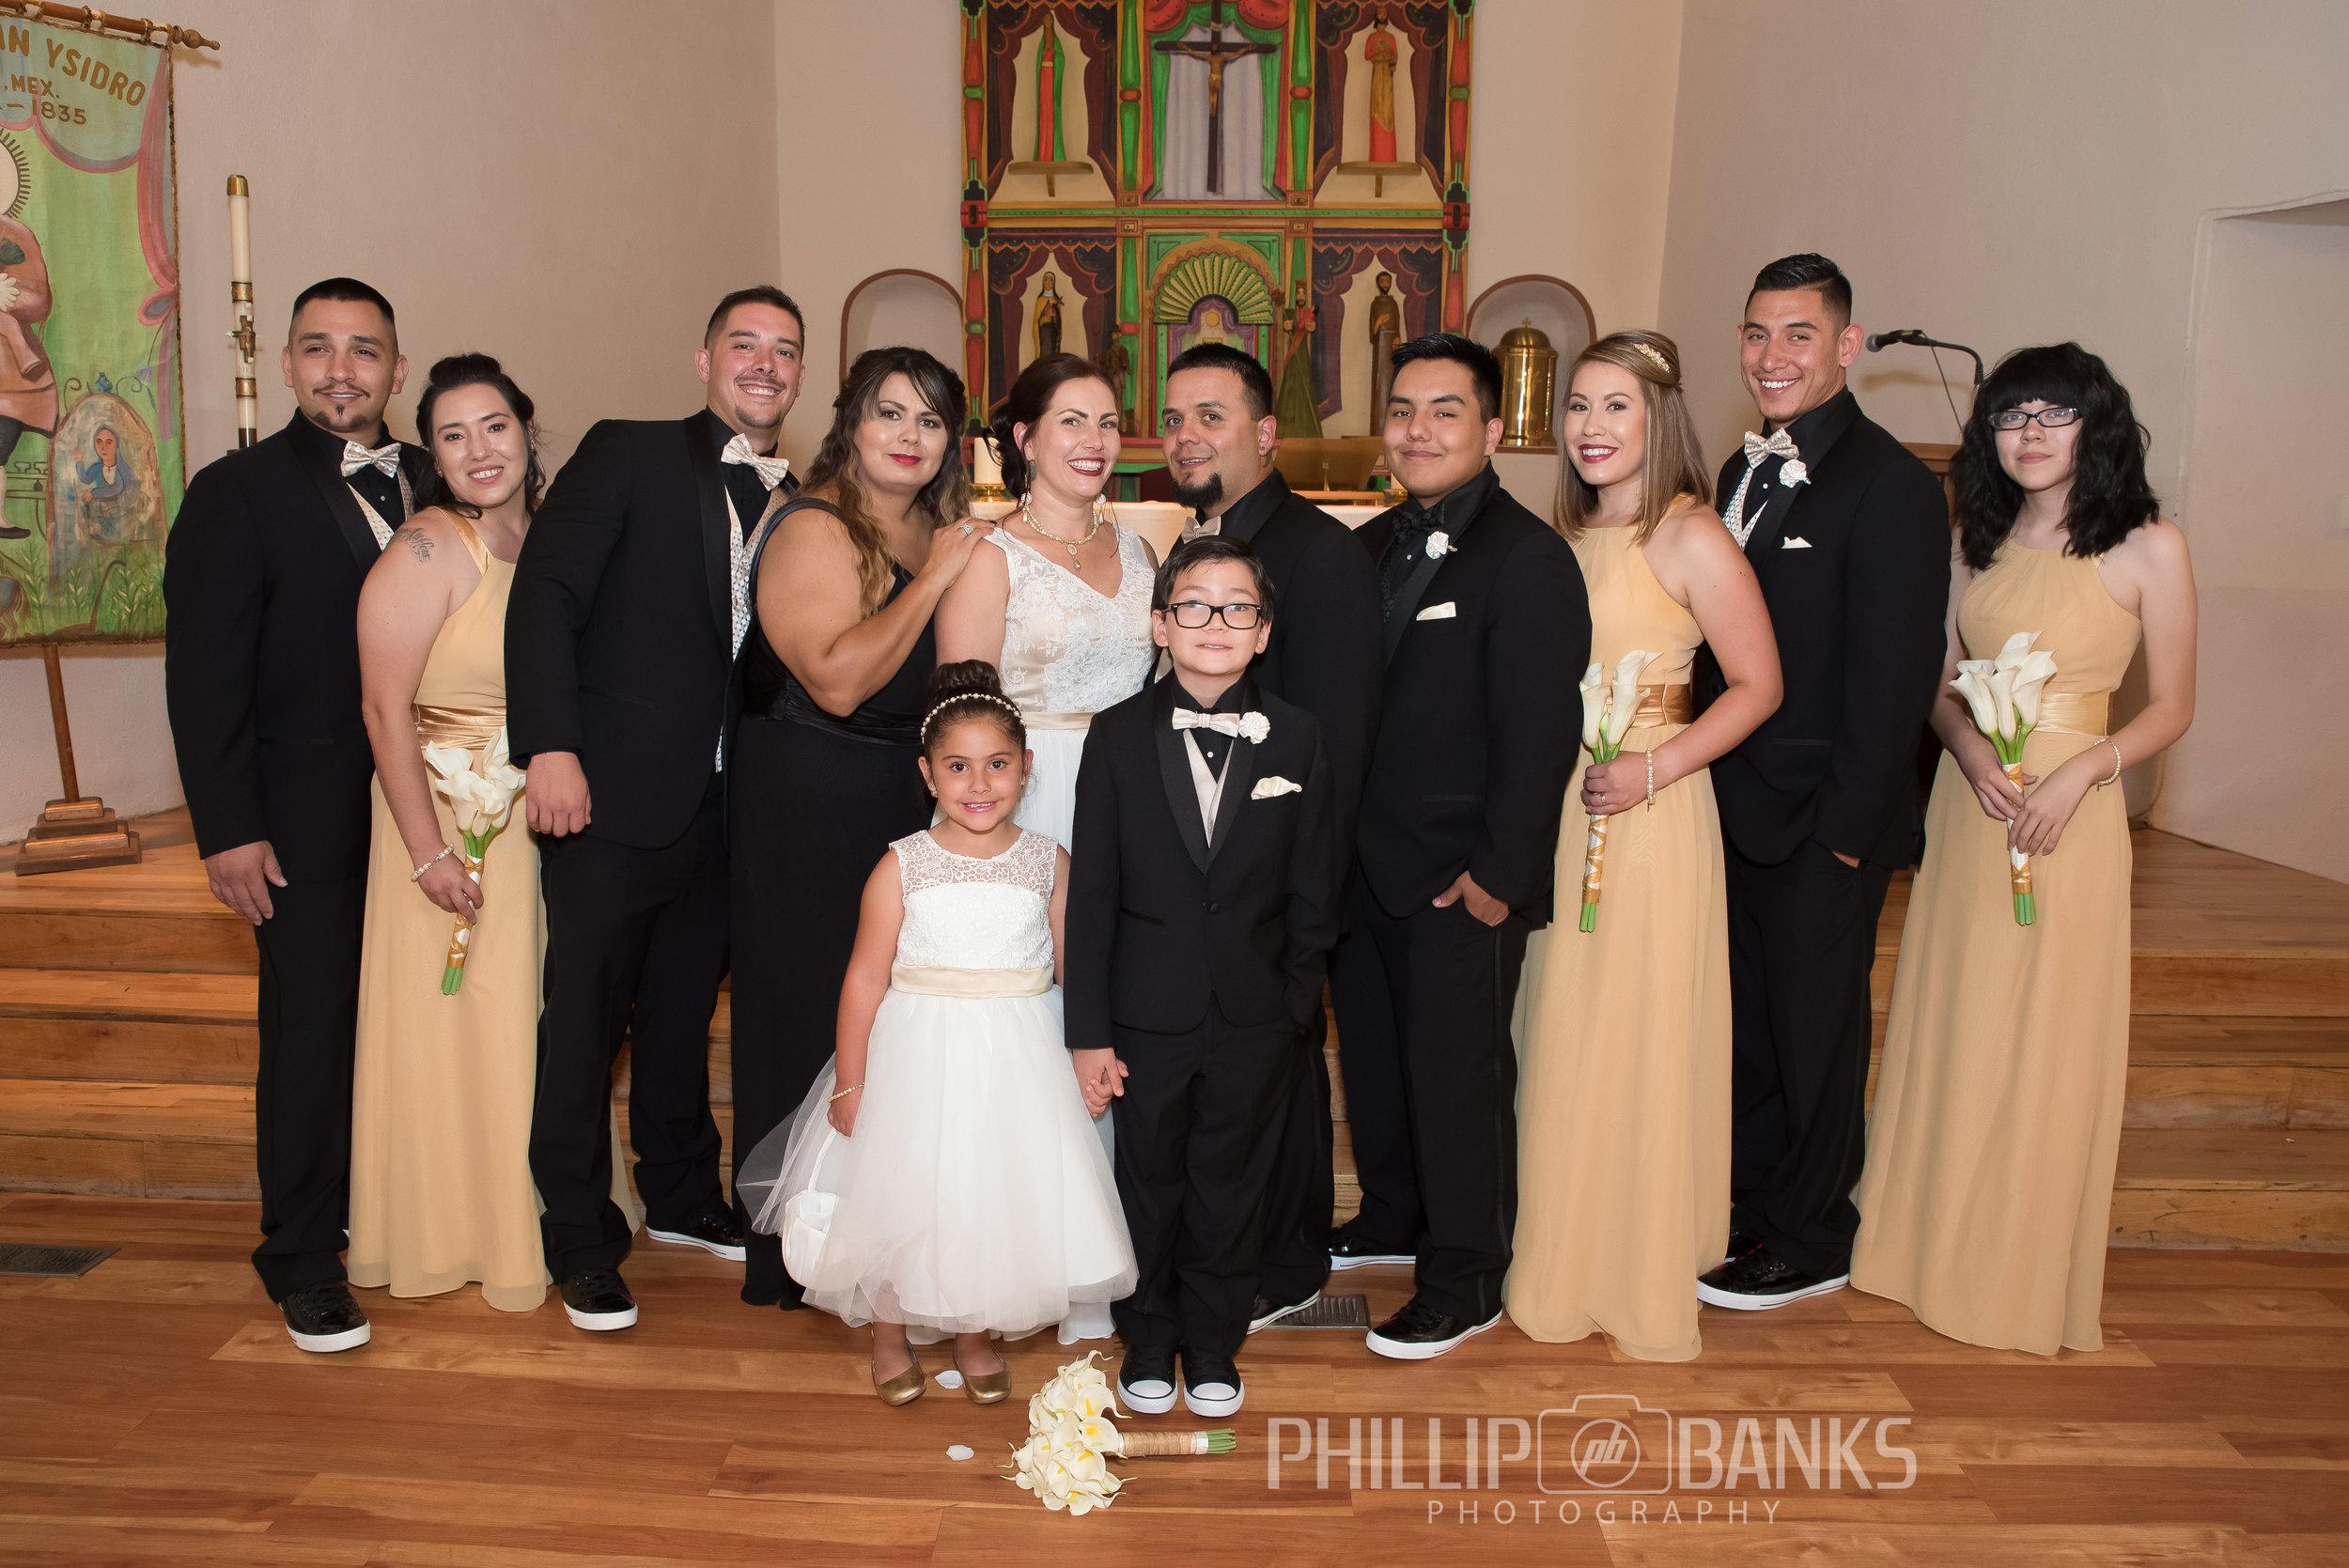 Albuquerque Wedding Photographer Phillip Banks Photography-Martinez Santa Fe Wedding (3).jpg